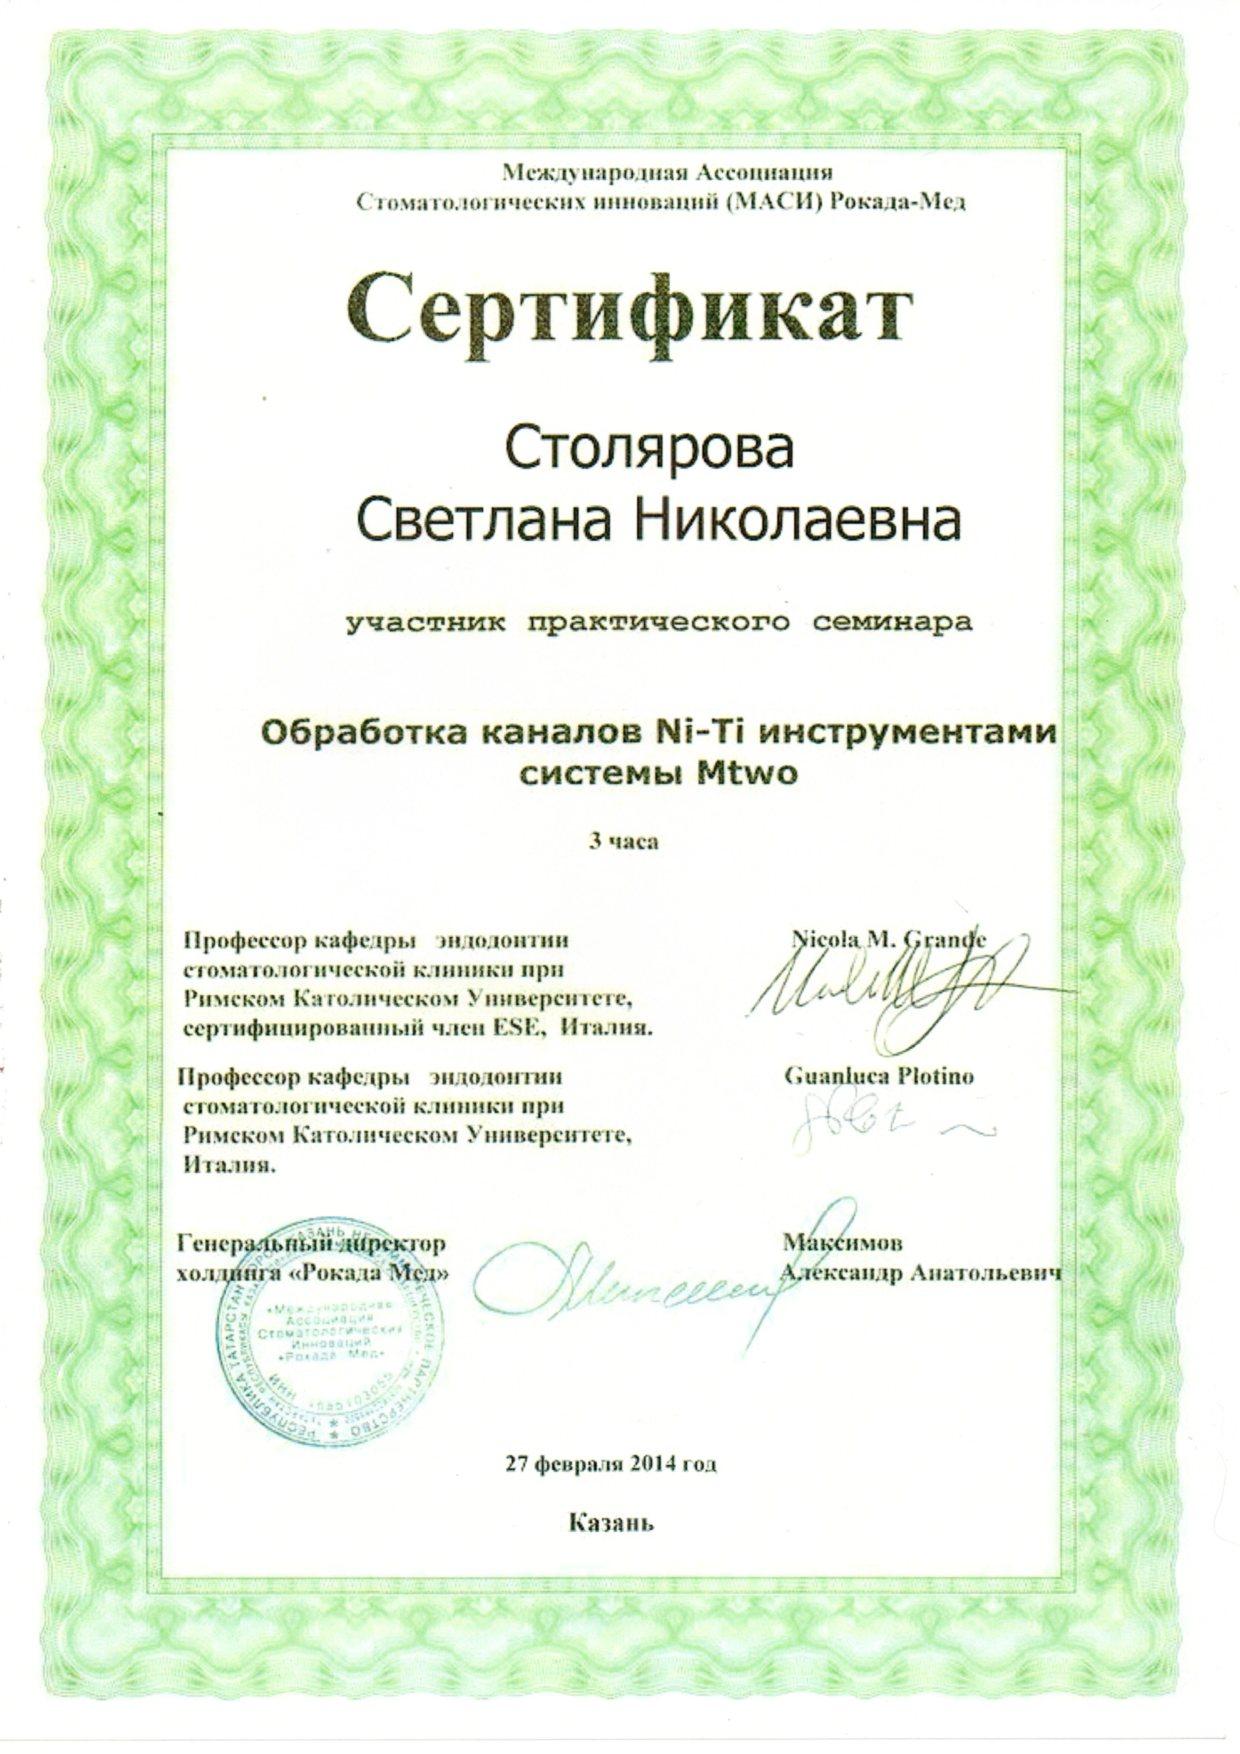 Столярова Светлана Николаевна - Сертификат_05